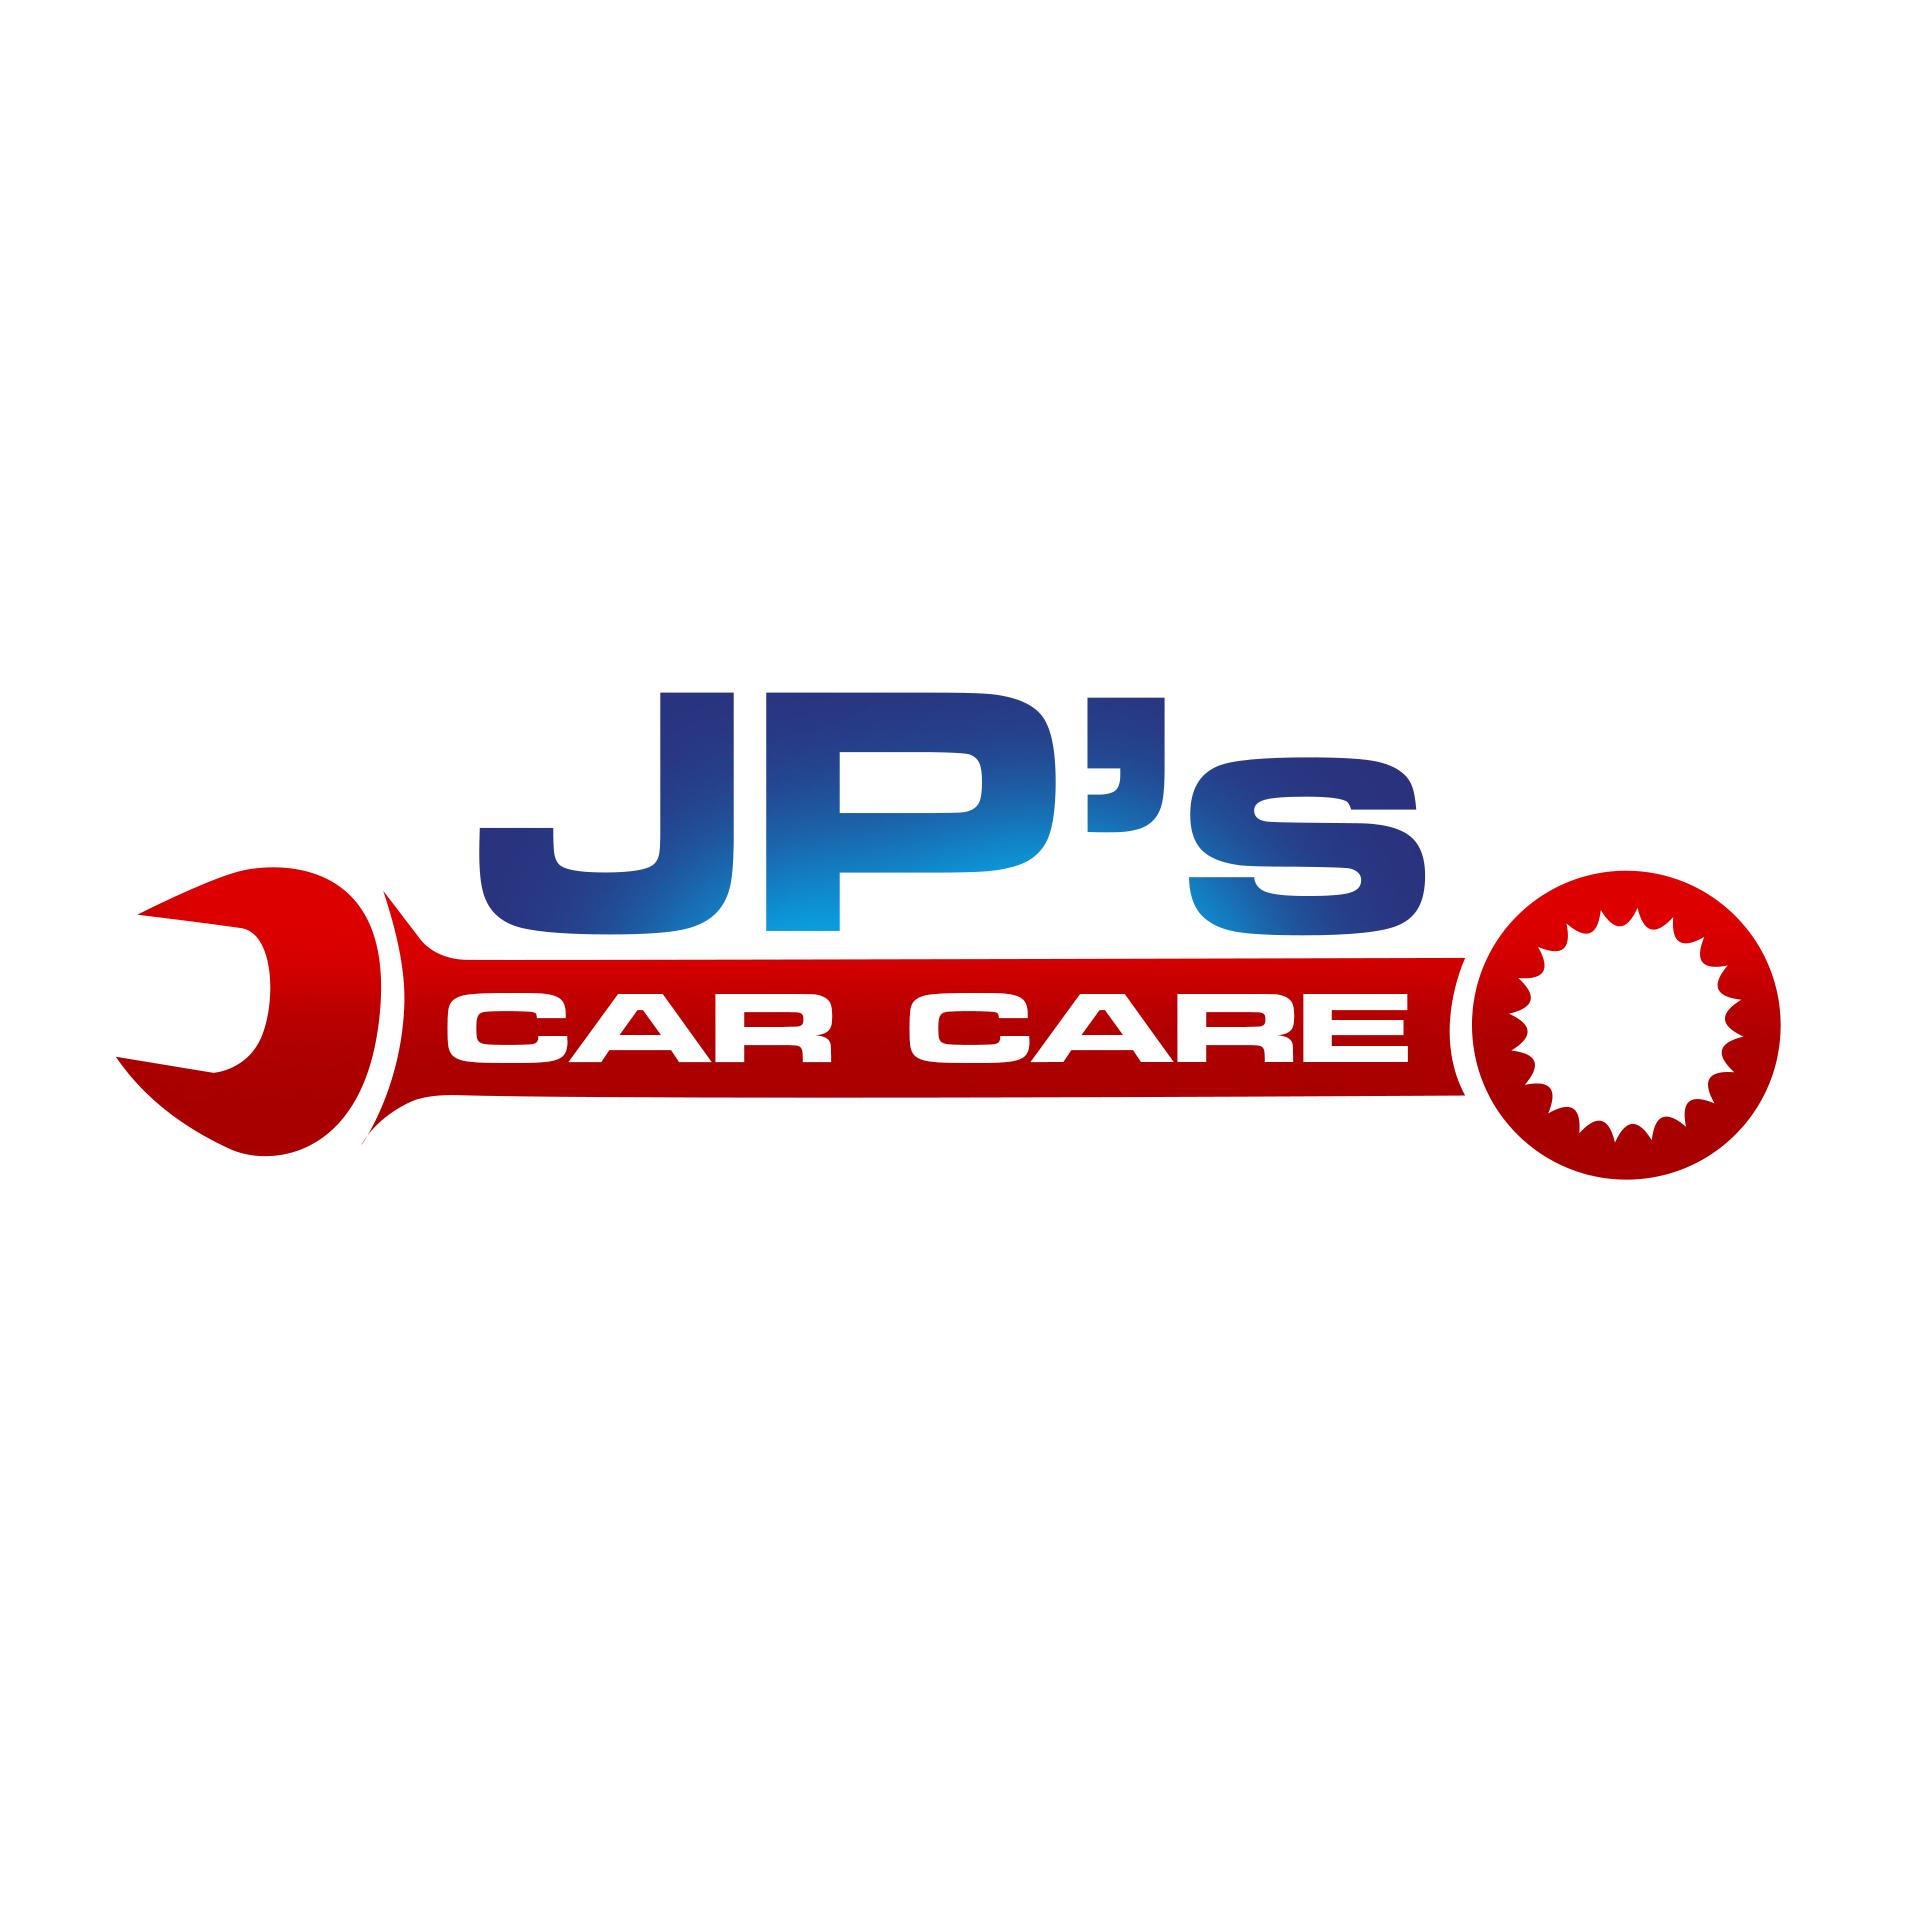 Discount Tire Hours Sunday >> JP's Car Care, Clearfield Utah (UT) - LocalDatabase.com